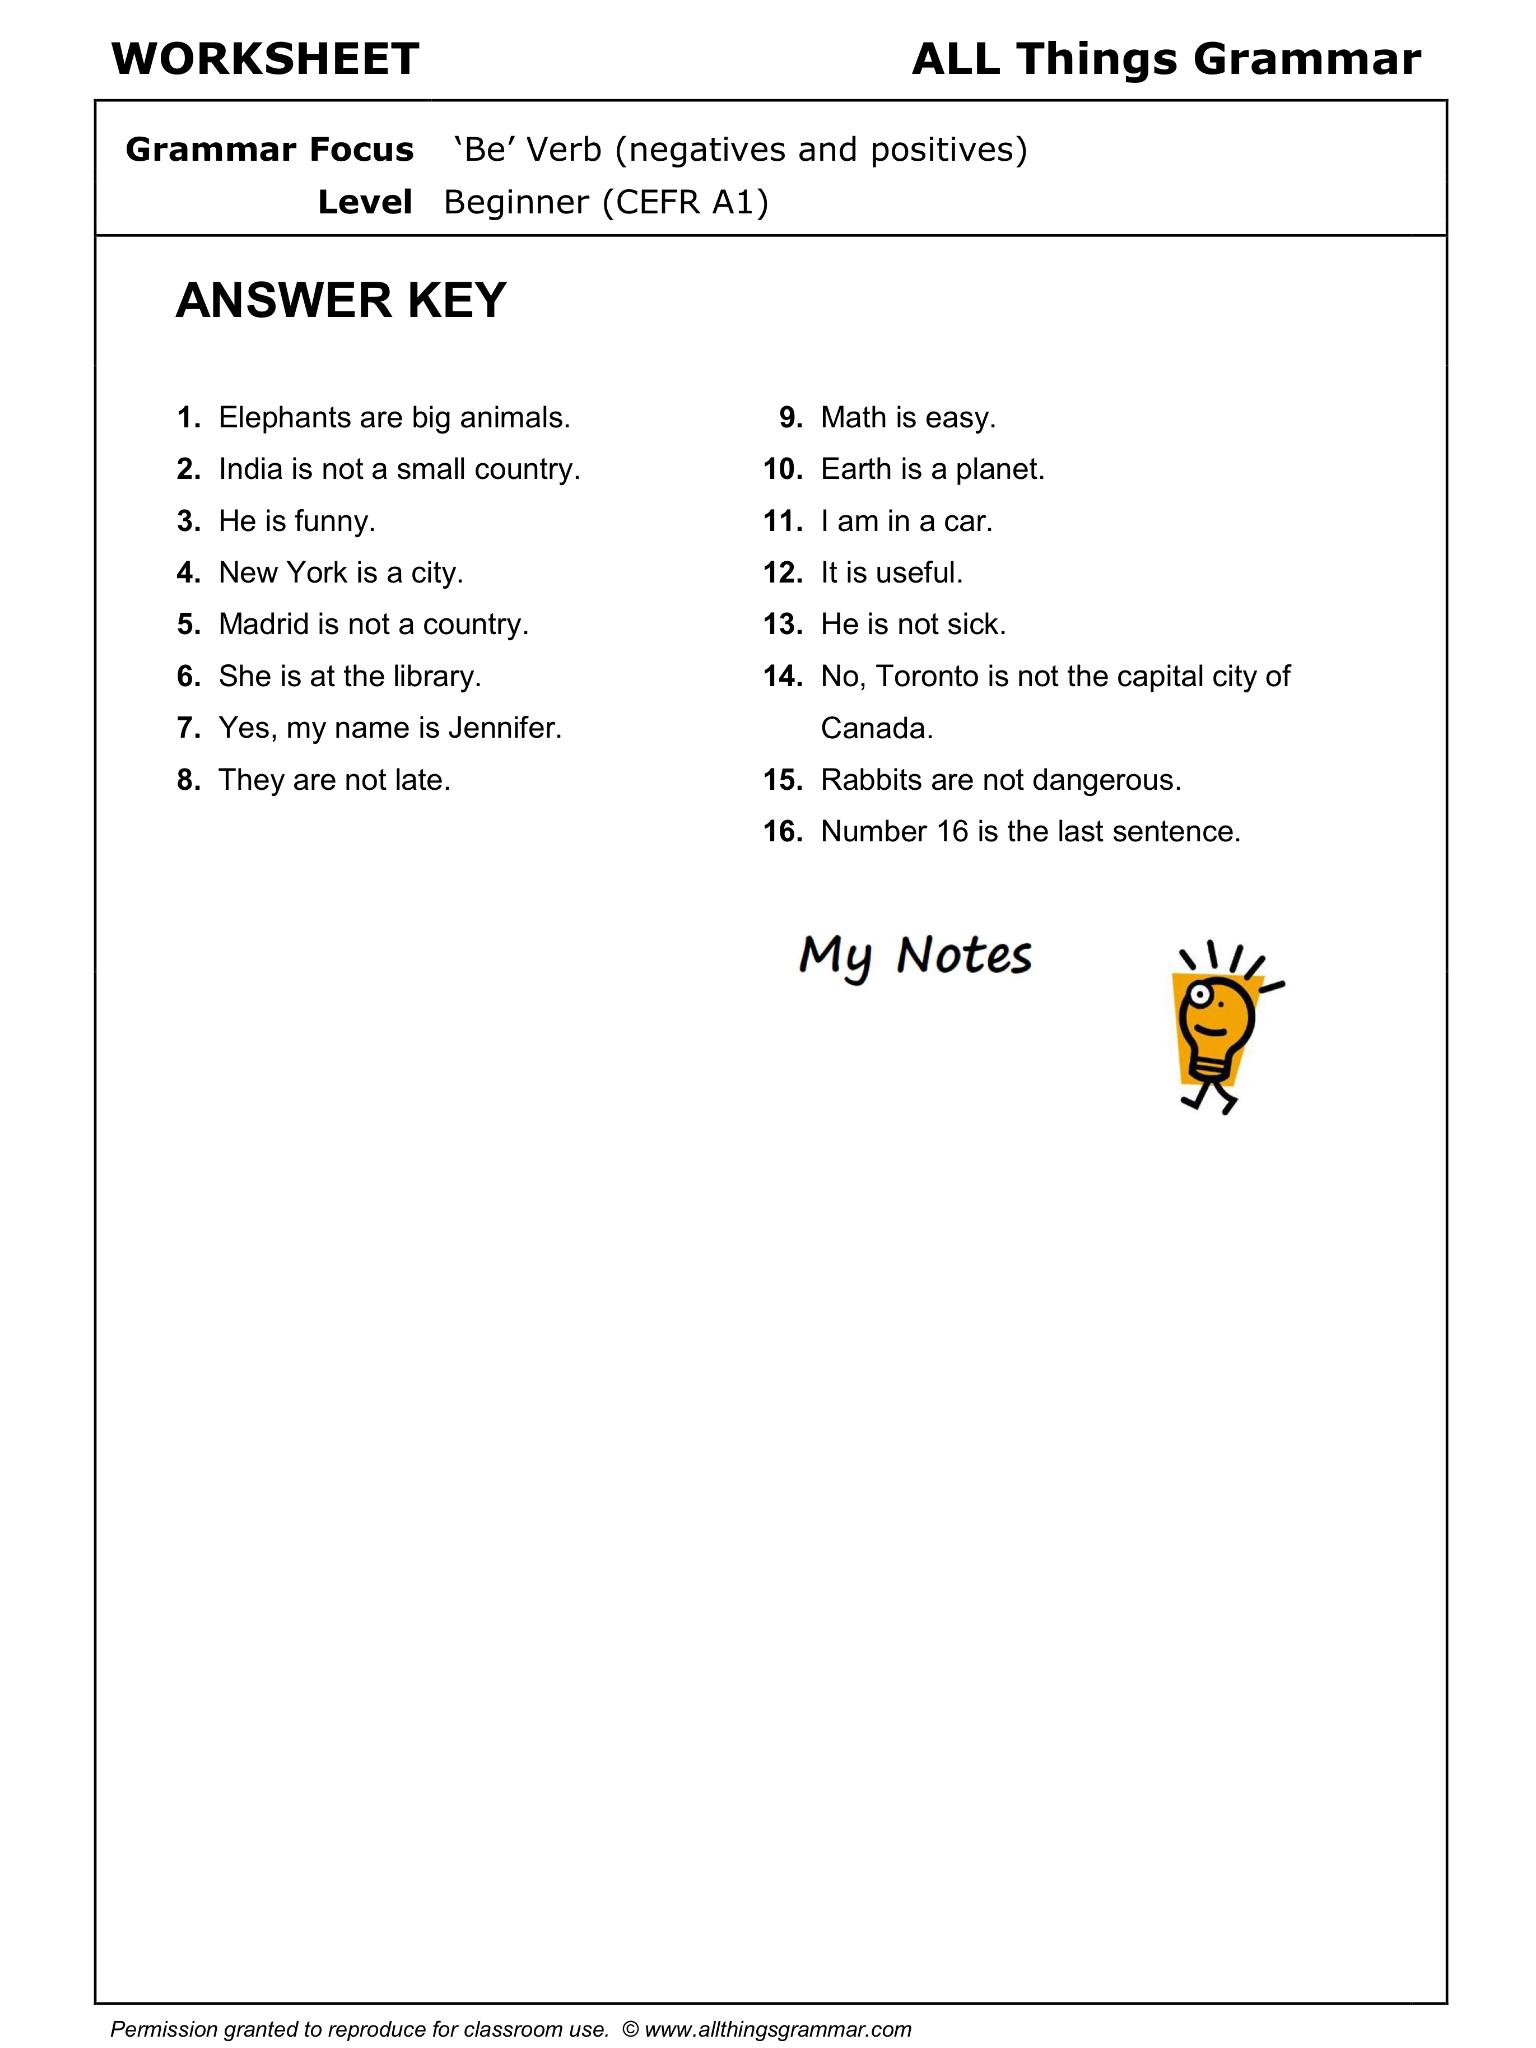 English Grammar Worksheet Be Verb Negatives And